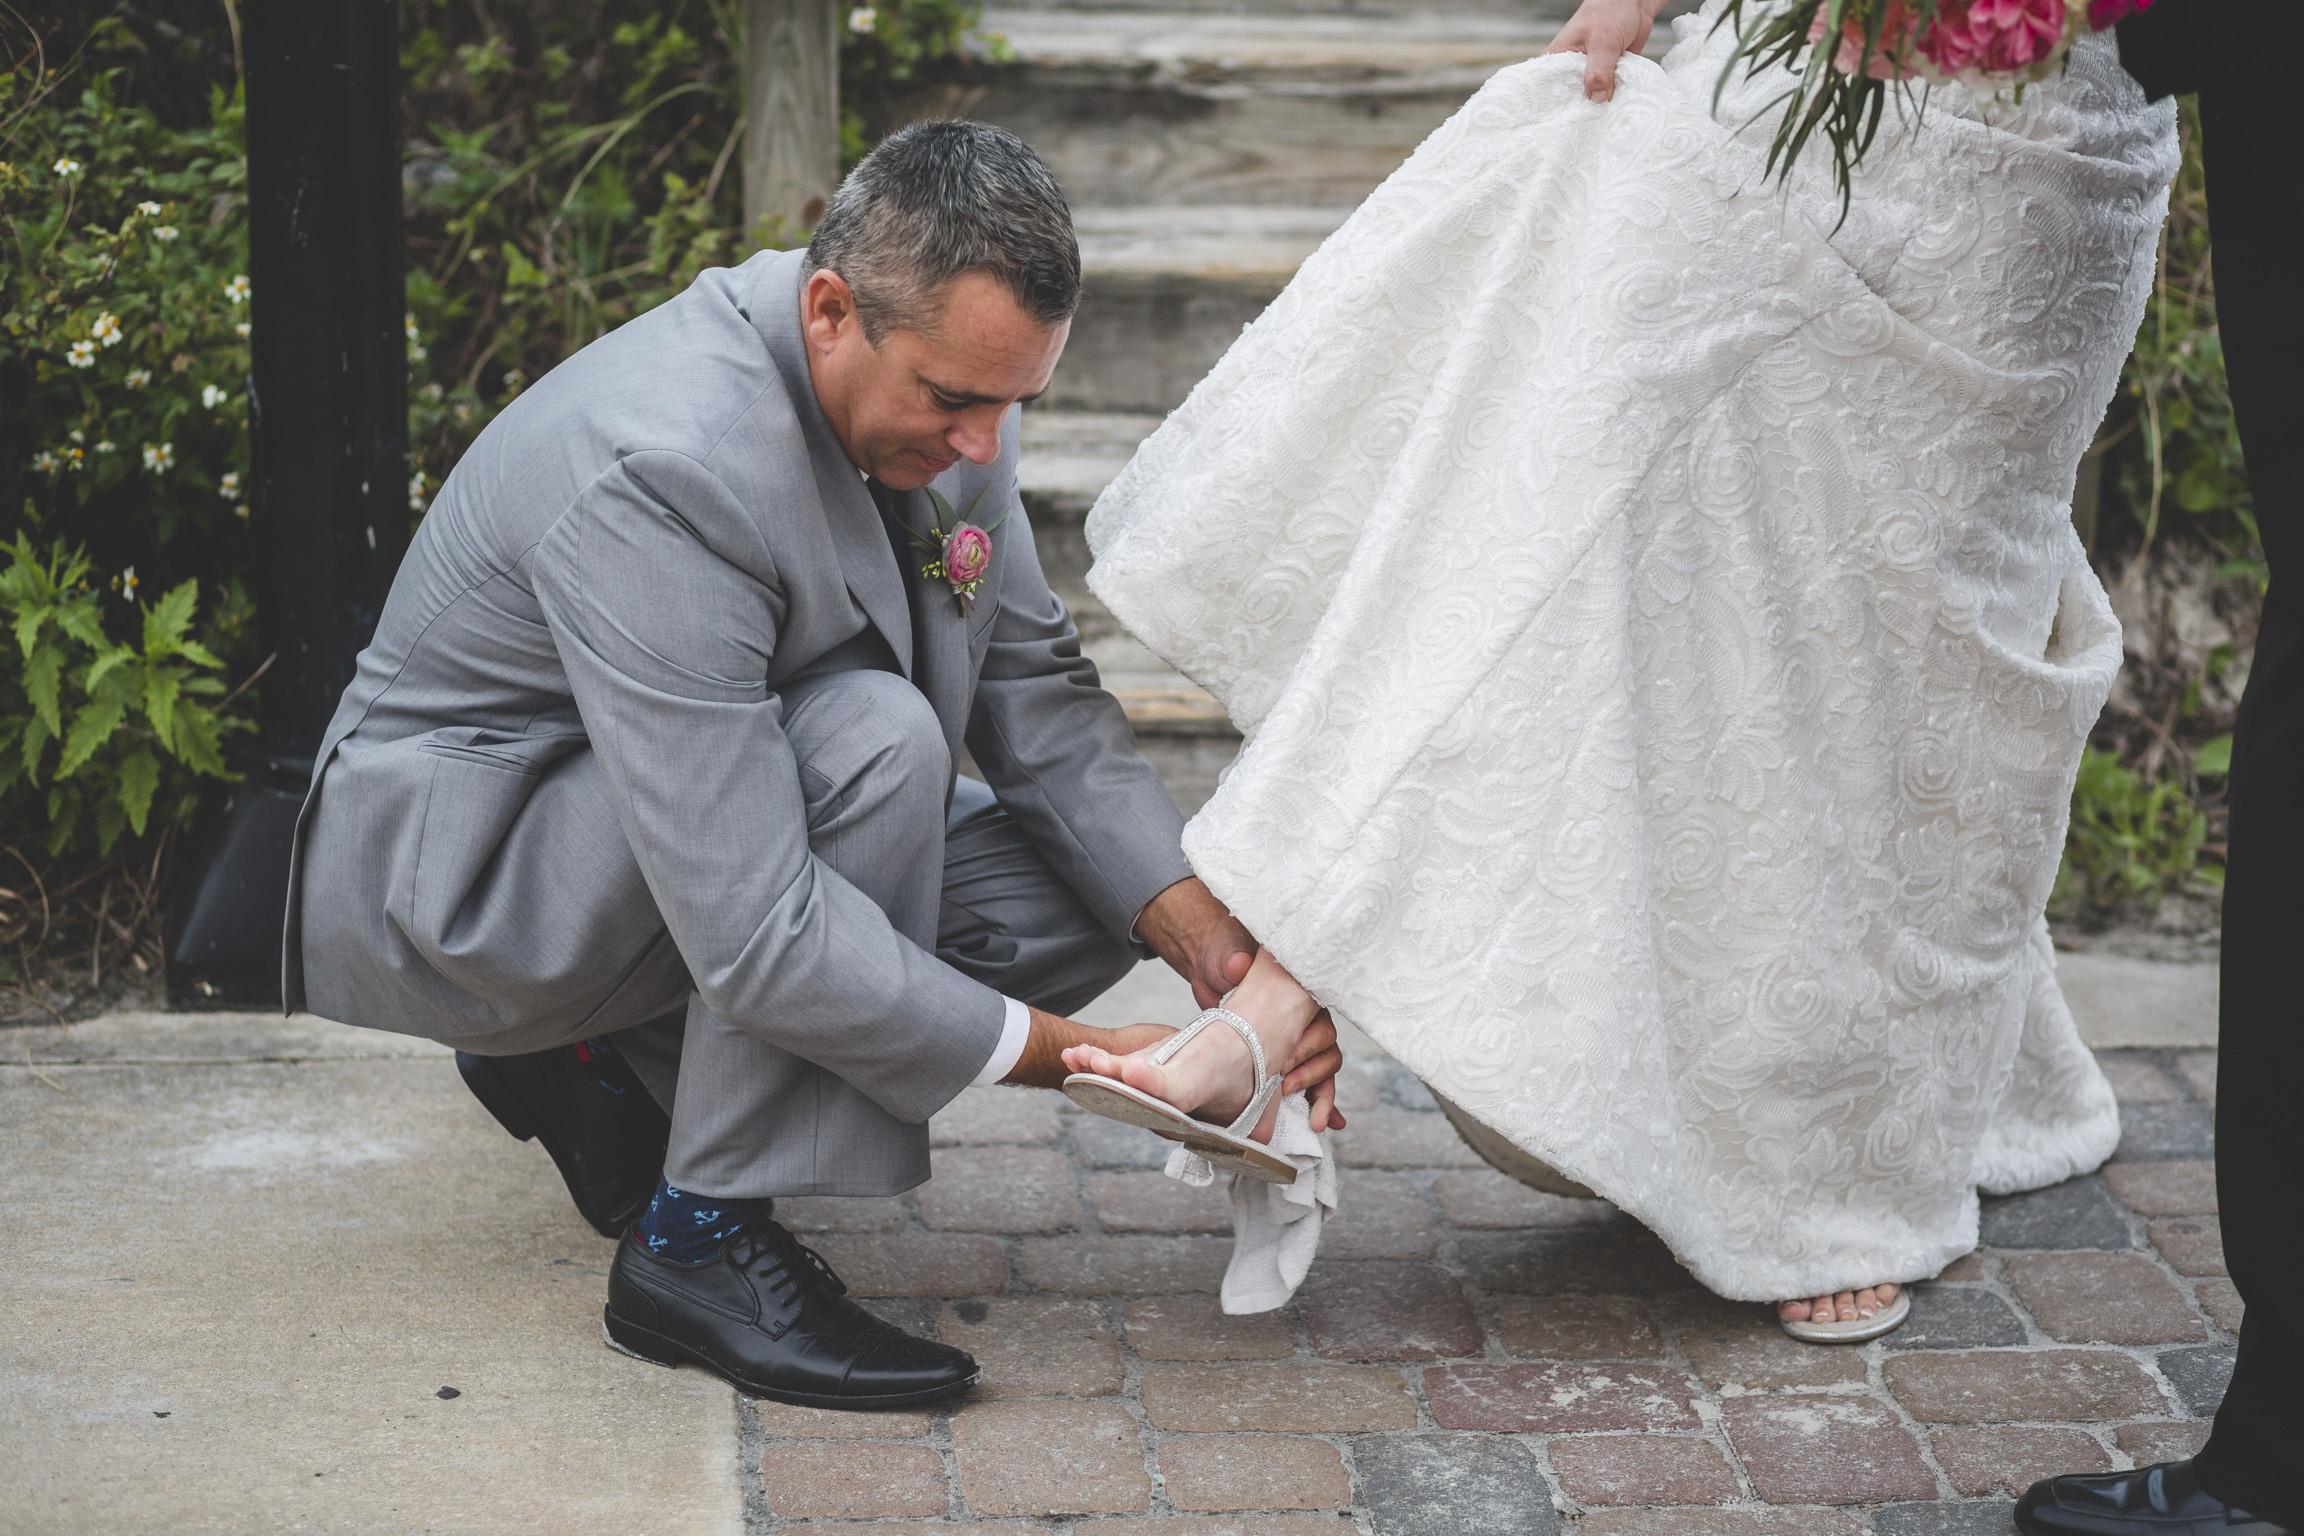 adam-szarmack-casa-marina-wedding-photographer-jacksonville-beach-florida-45.jpg